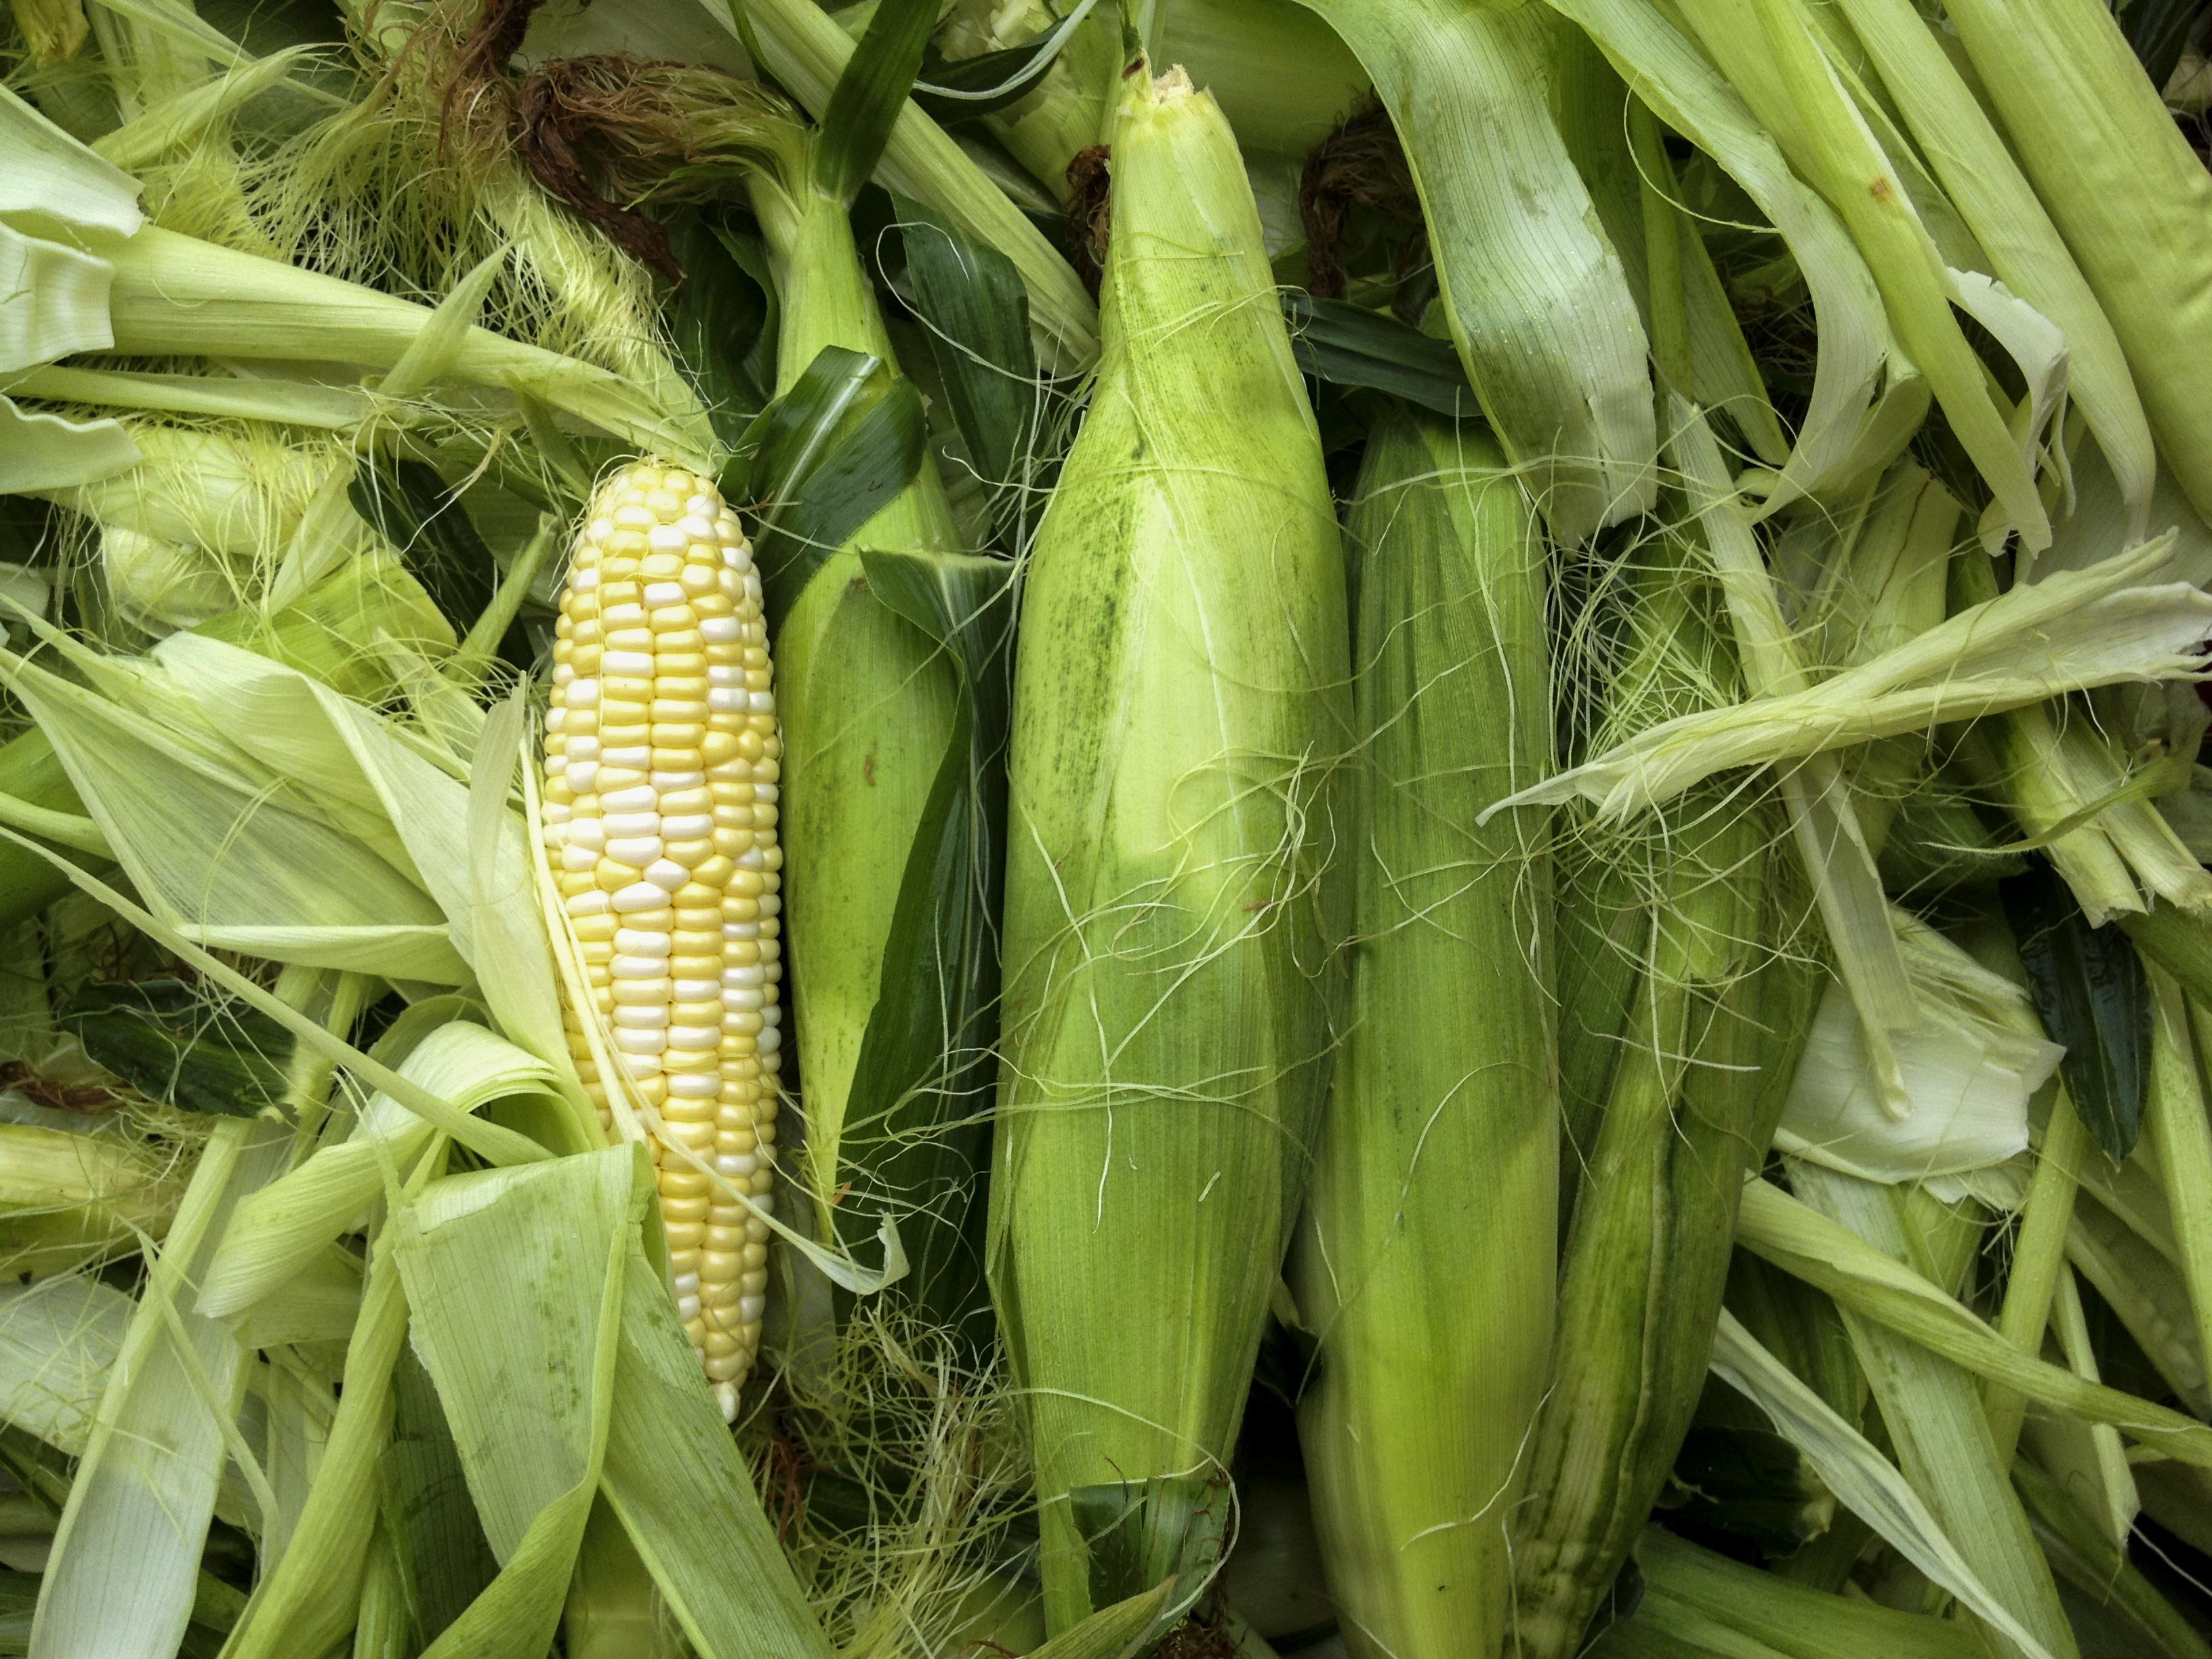 2012-07-27_Reesor_Farm_Fruit_002.jpg